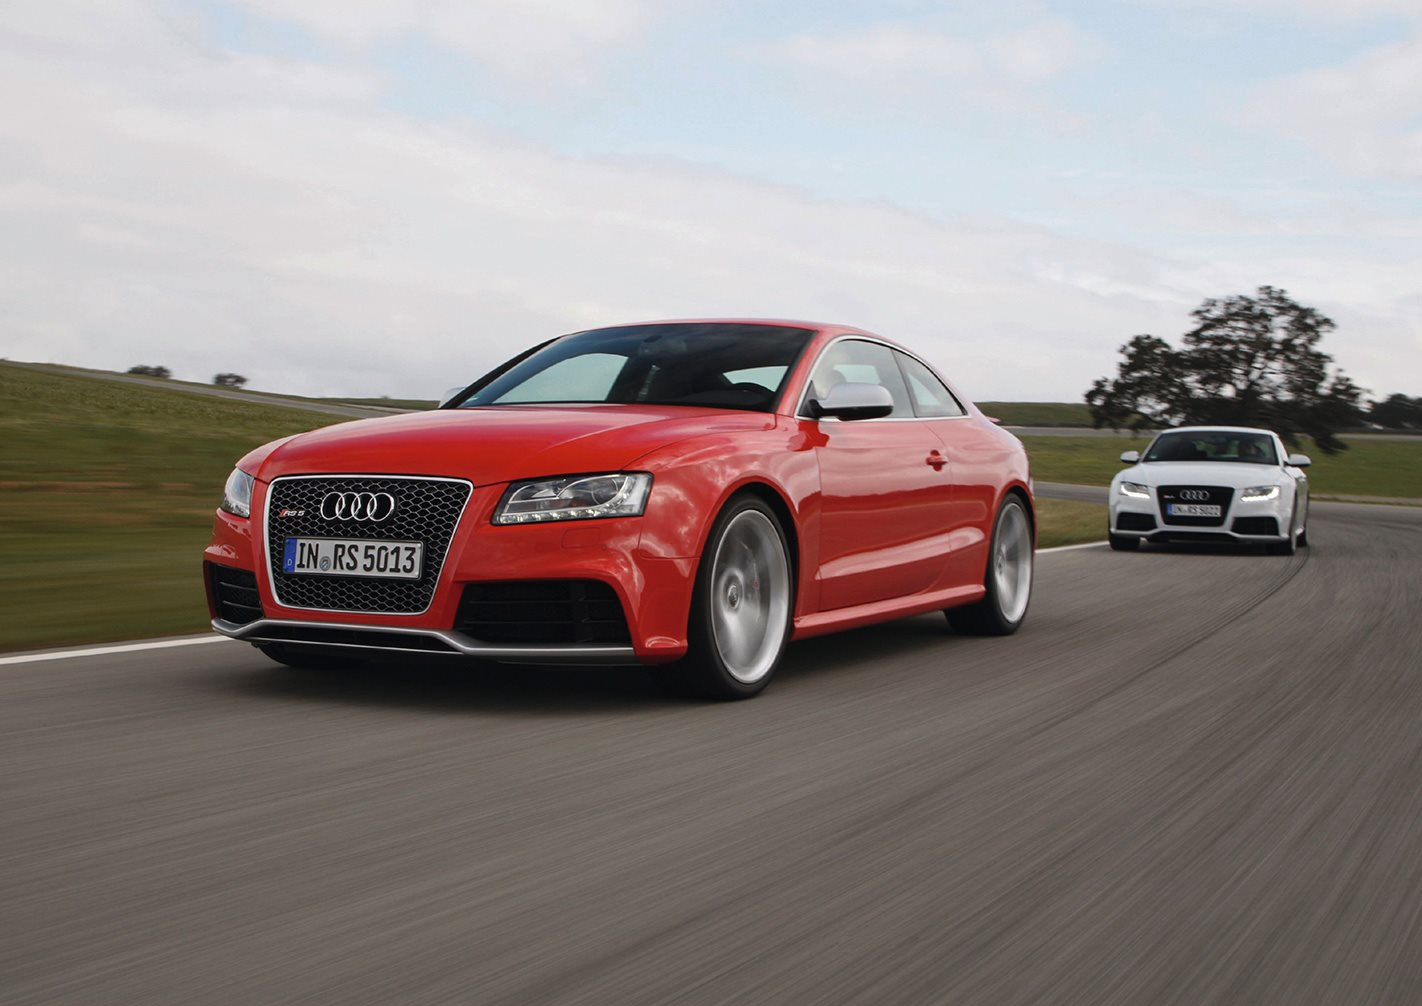 2010 Audi RS5 testing